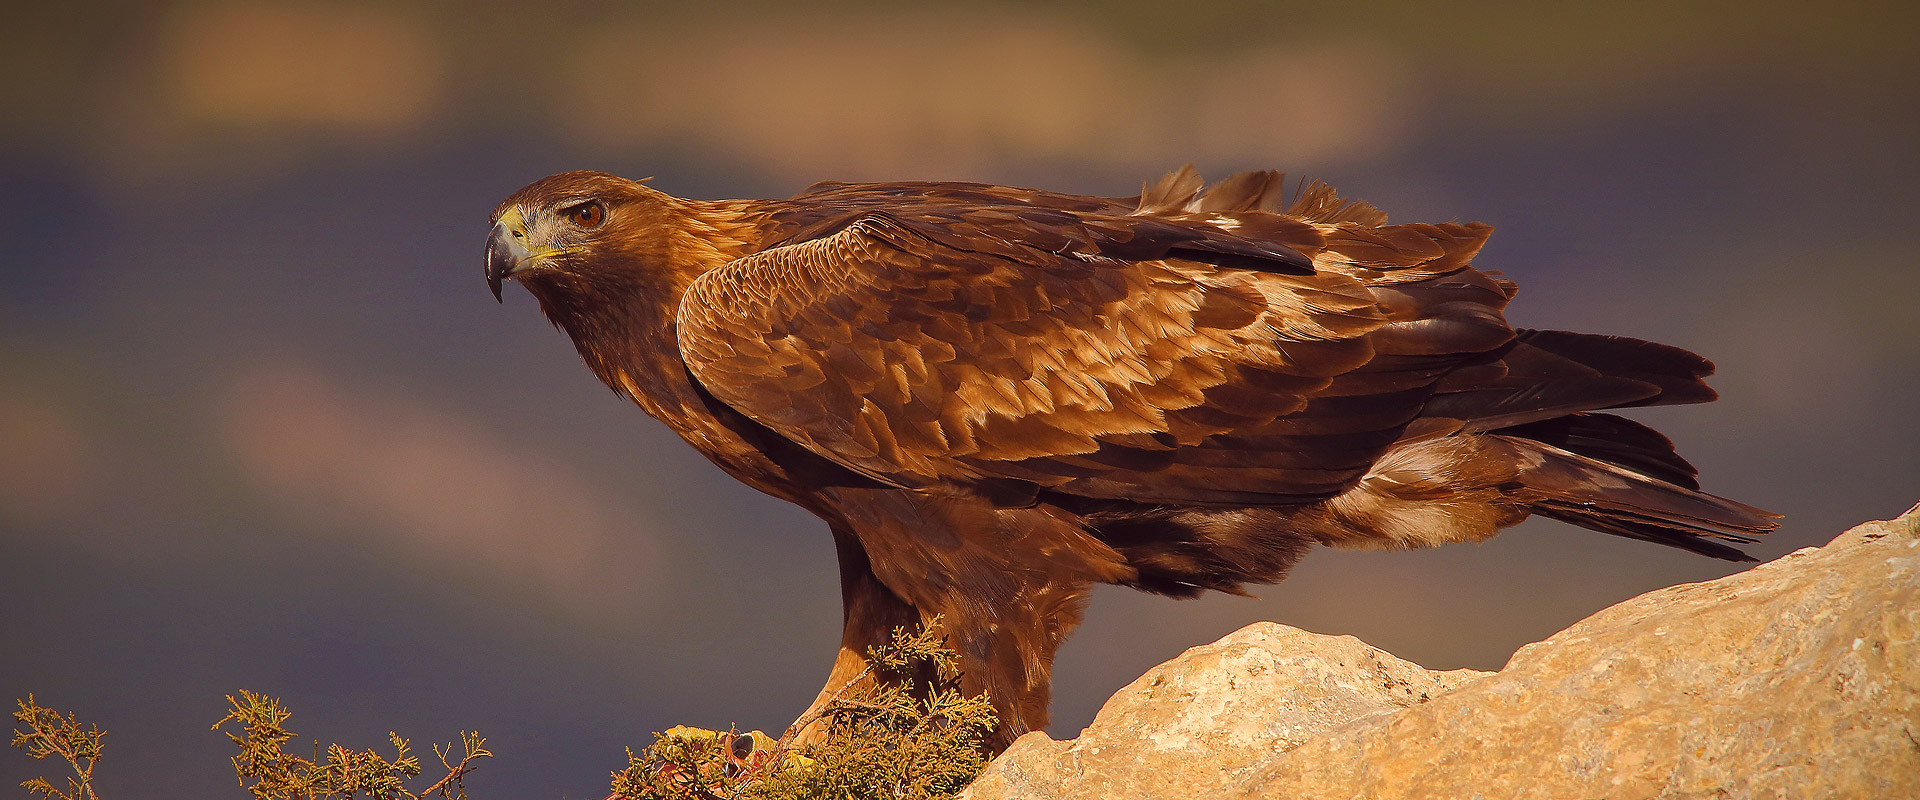 Birdwaching Alicante águila real